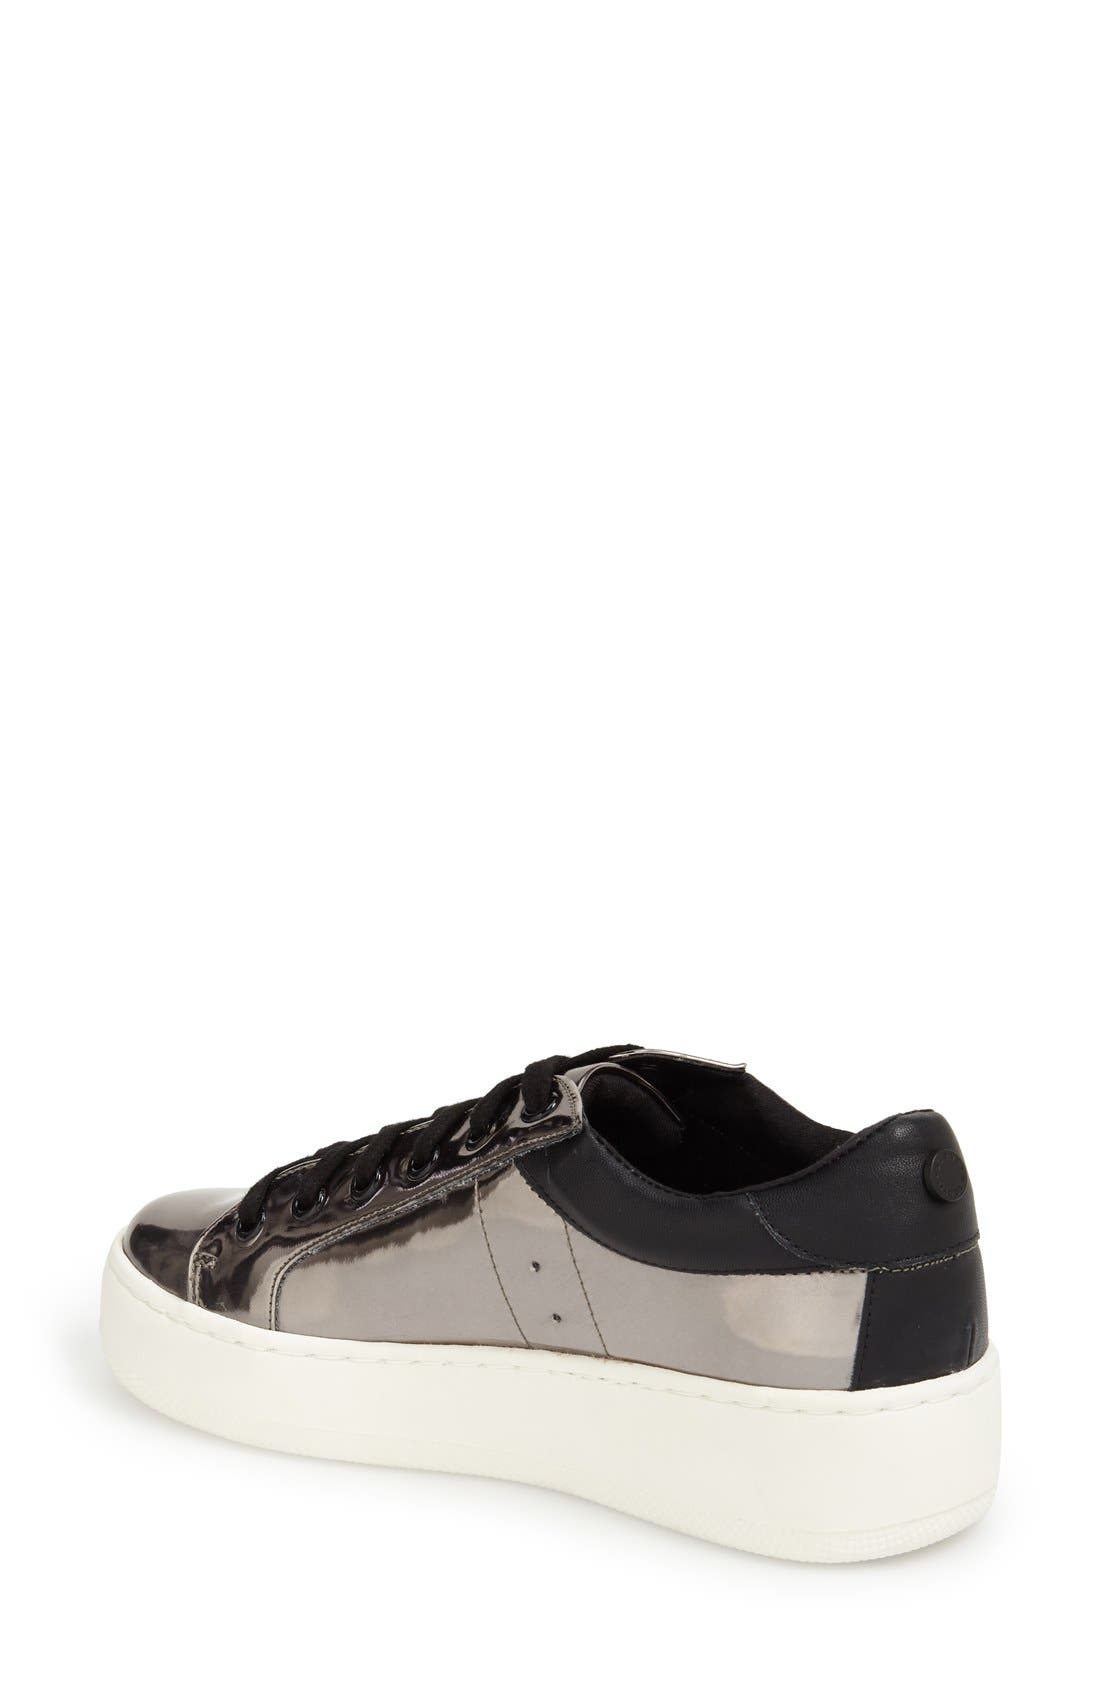 Alternate Image 2  - Steve Madden Bertie Metallic Platform Sneaker (Women)